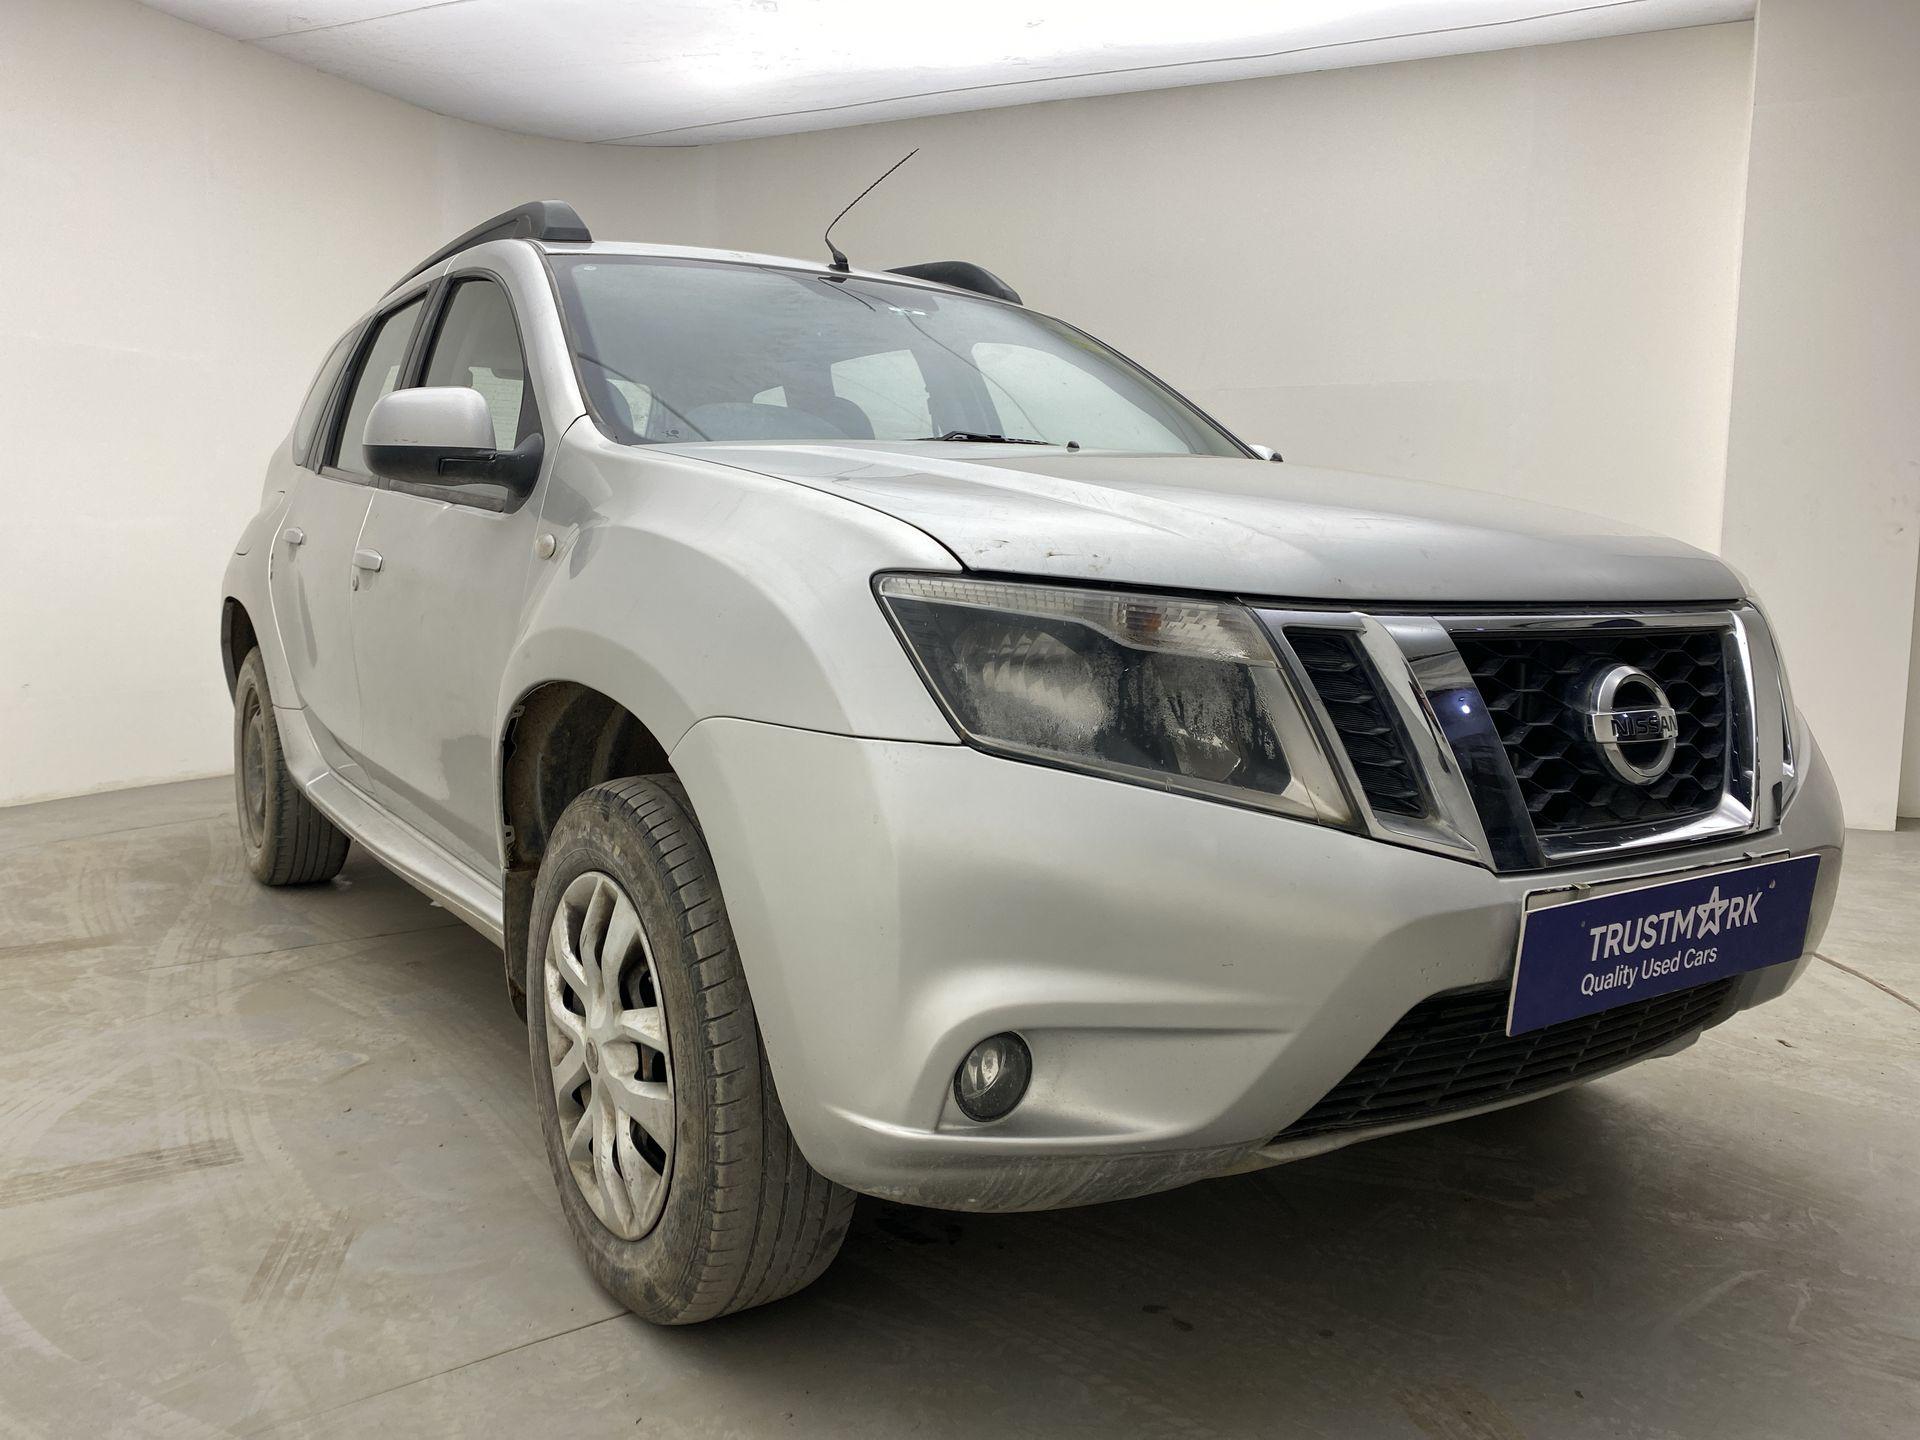 Nissan Terrano XL 110 PS